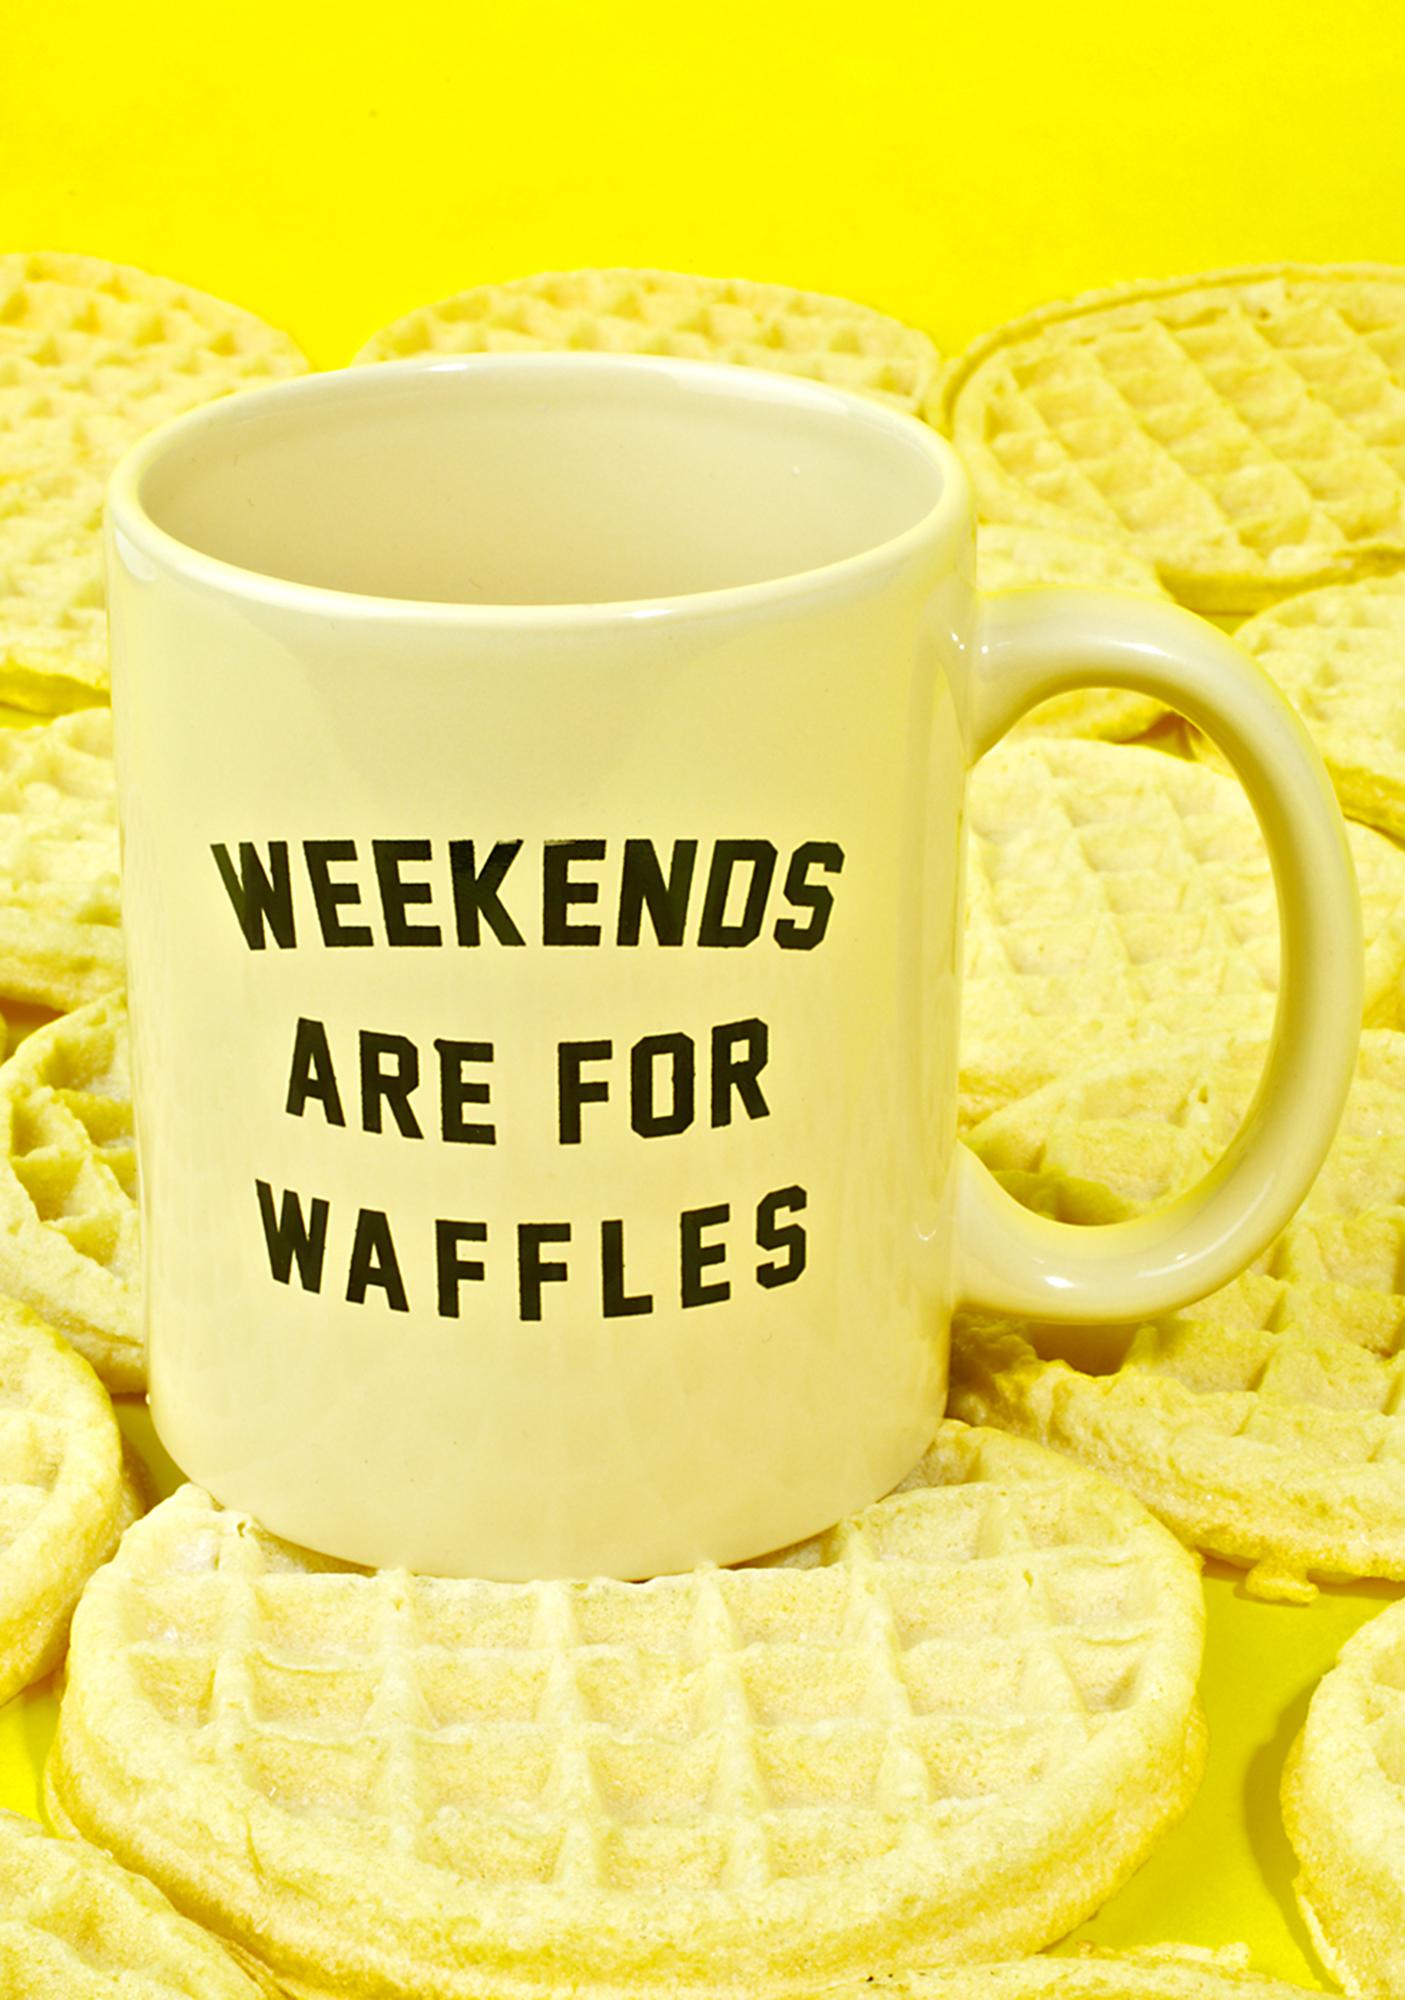 Weekend Waffle Mug